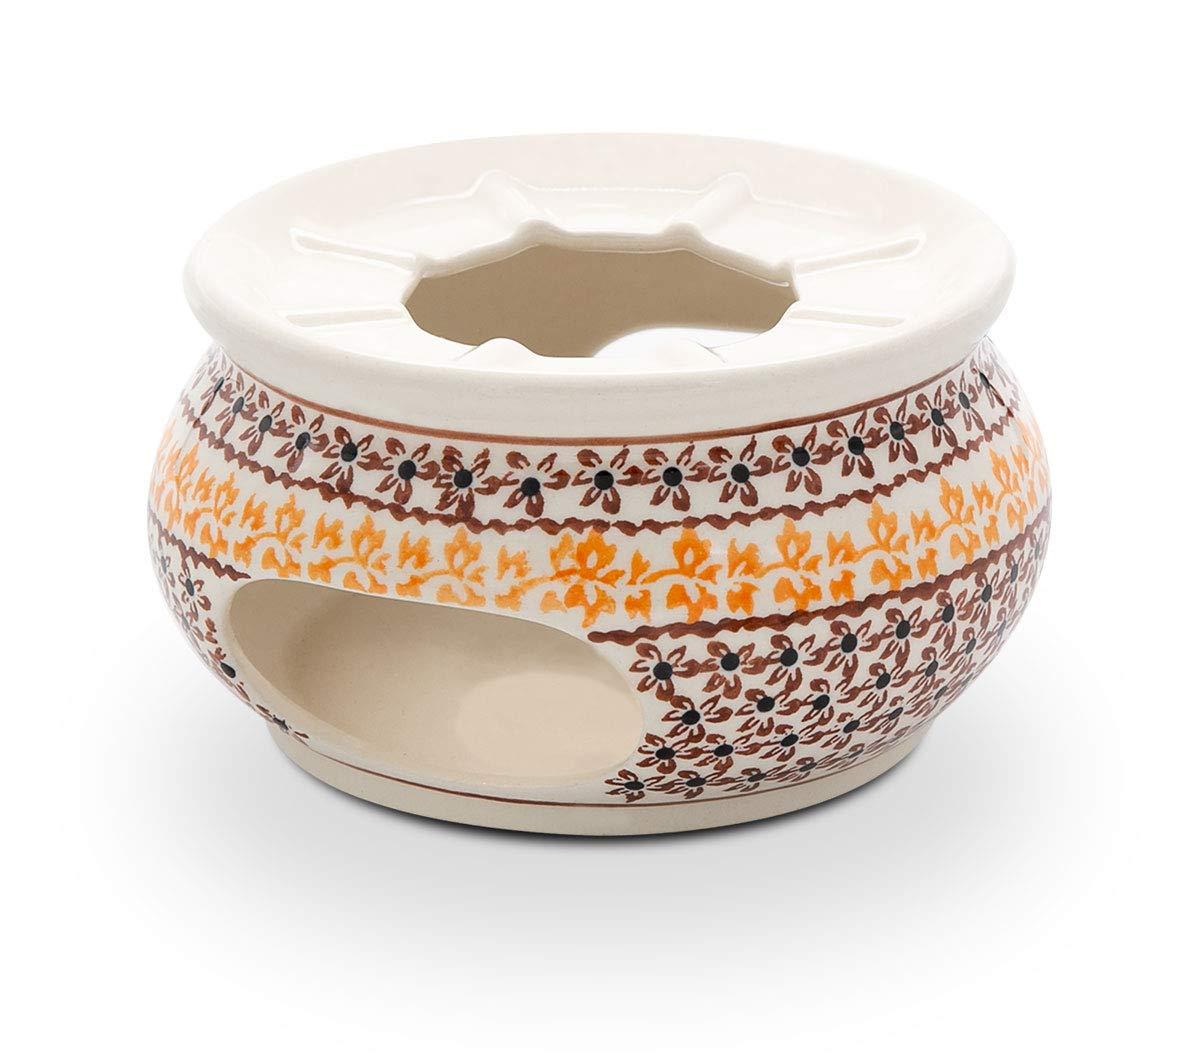 Hand-Decorated Polish Pottery Teapot Warmer ø13.9cm for Teapot/Coffee Pot Design 973